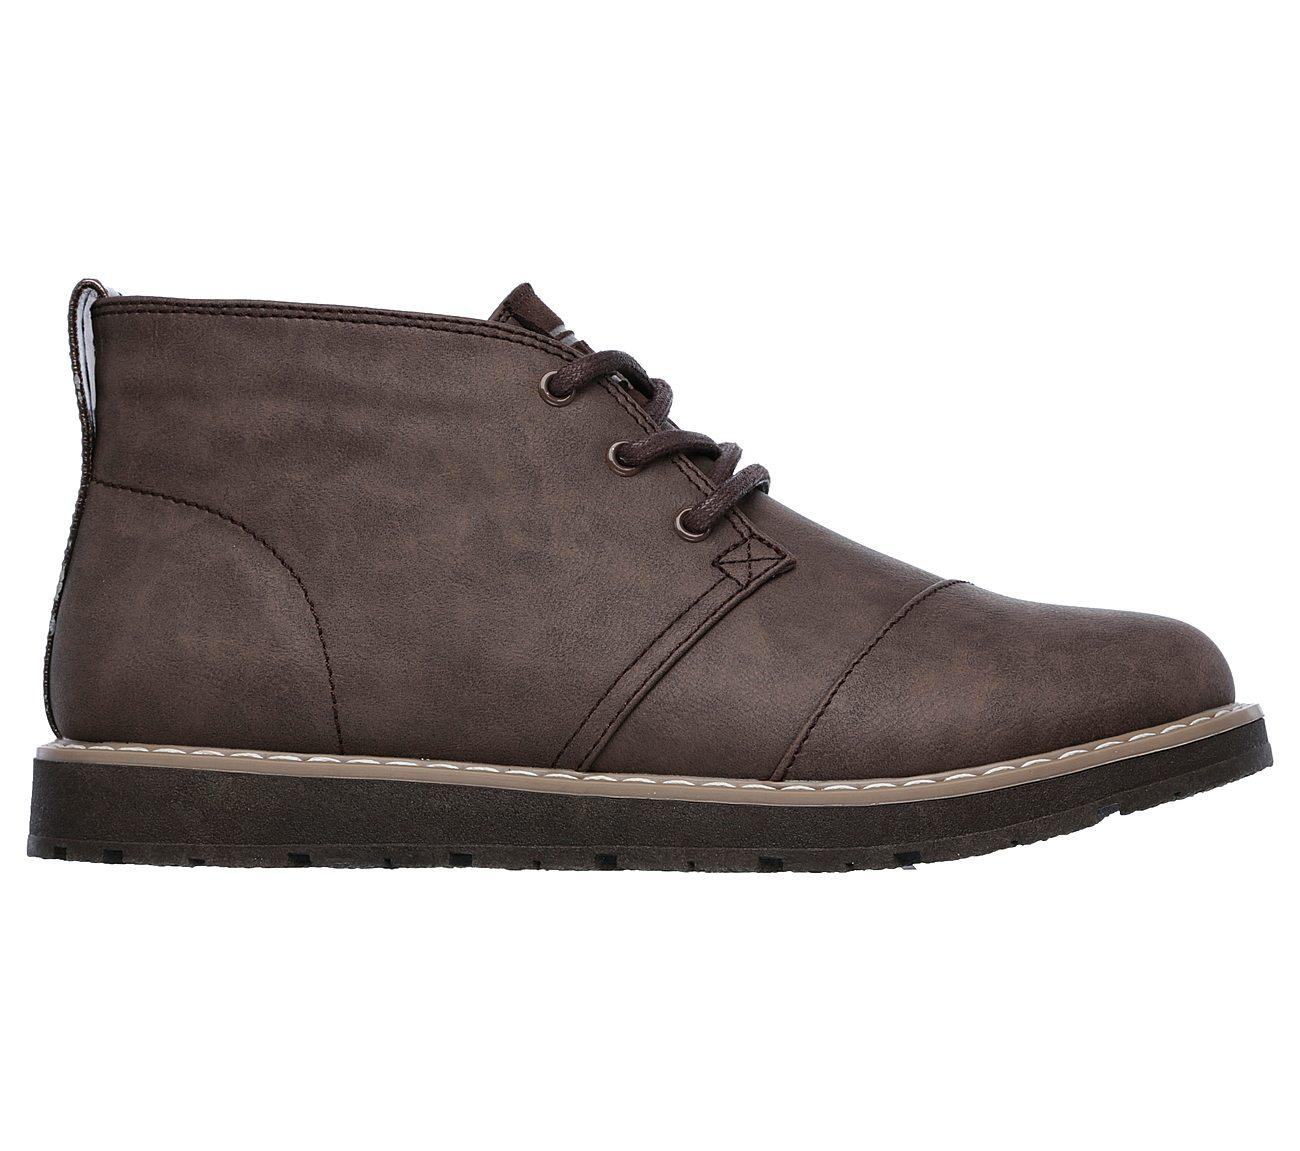 SKECHERS Bobs Alpine SKECHERS Bobs Shoes